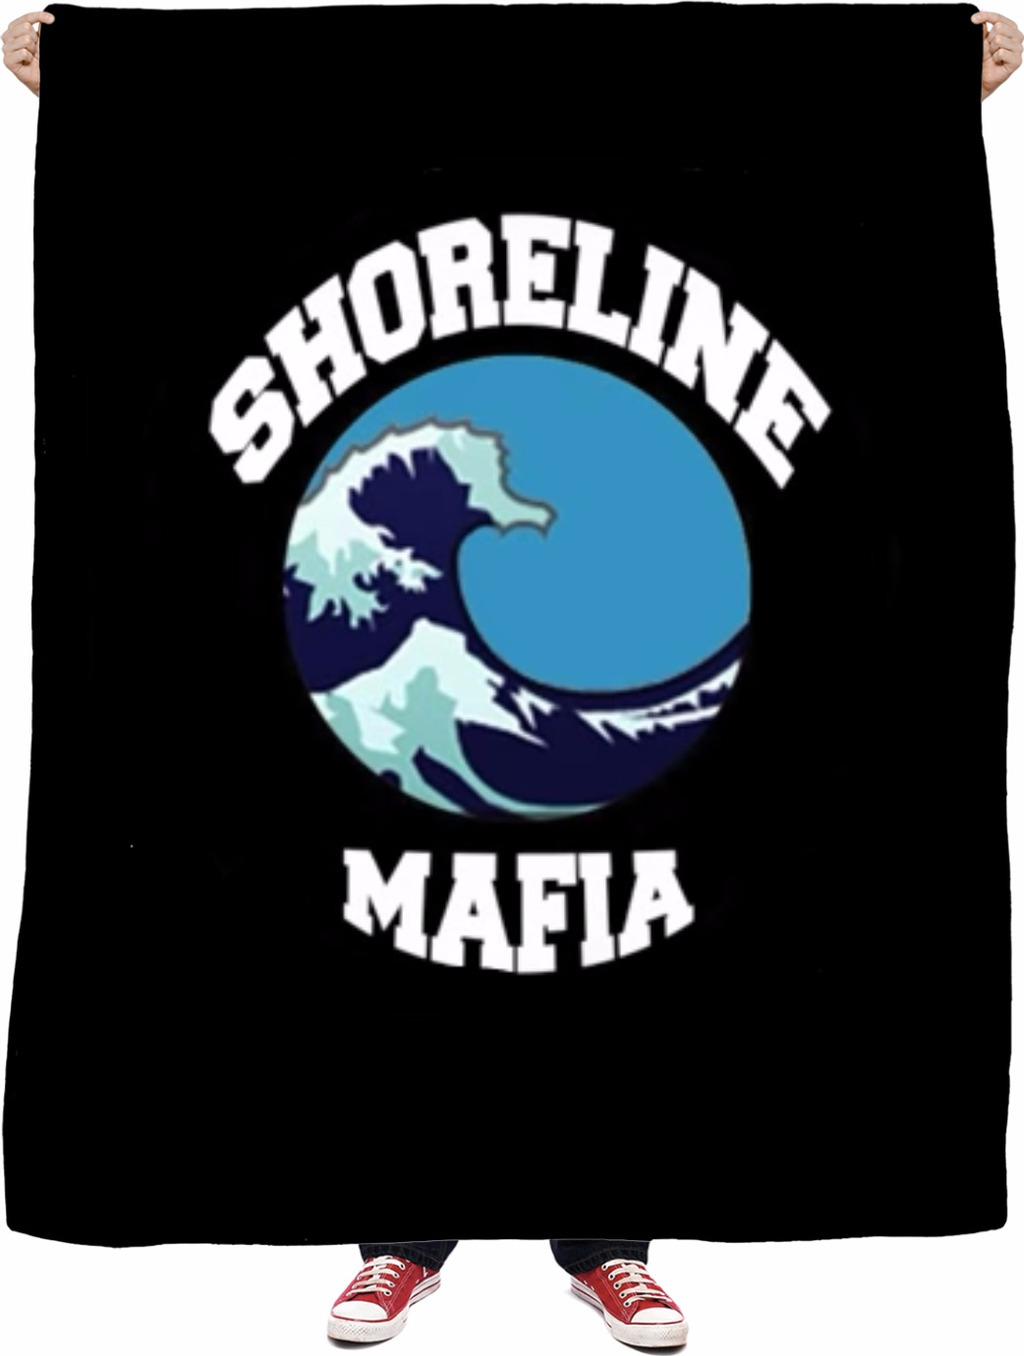 Shoreline Mafia Shirts, Hoodies And More.